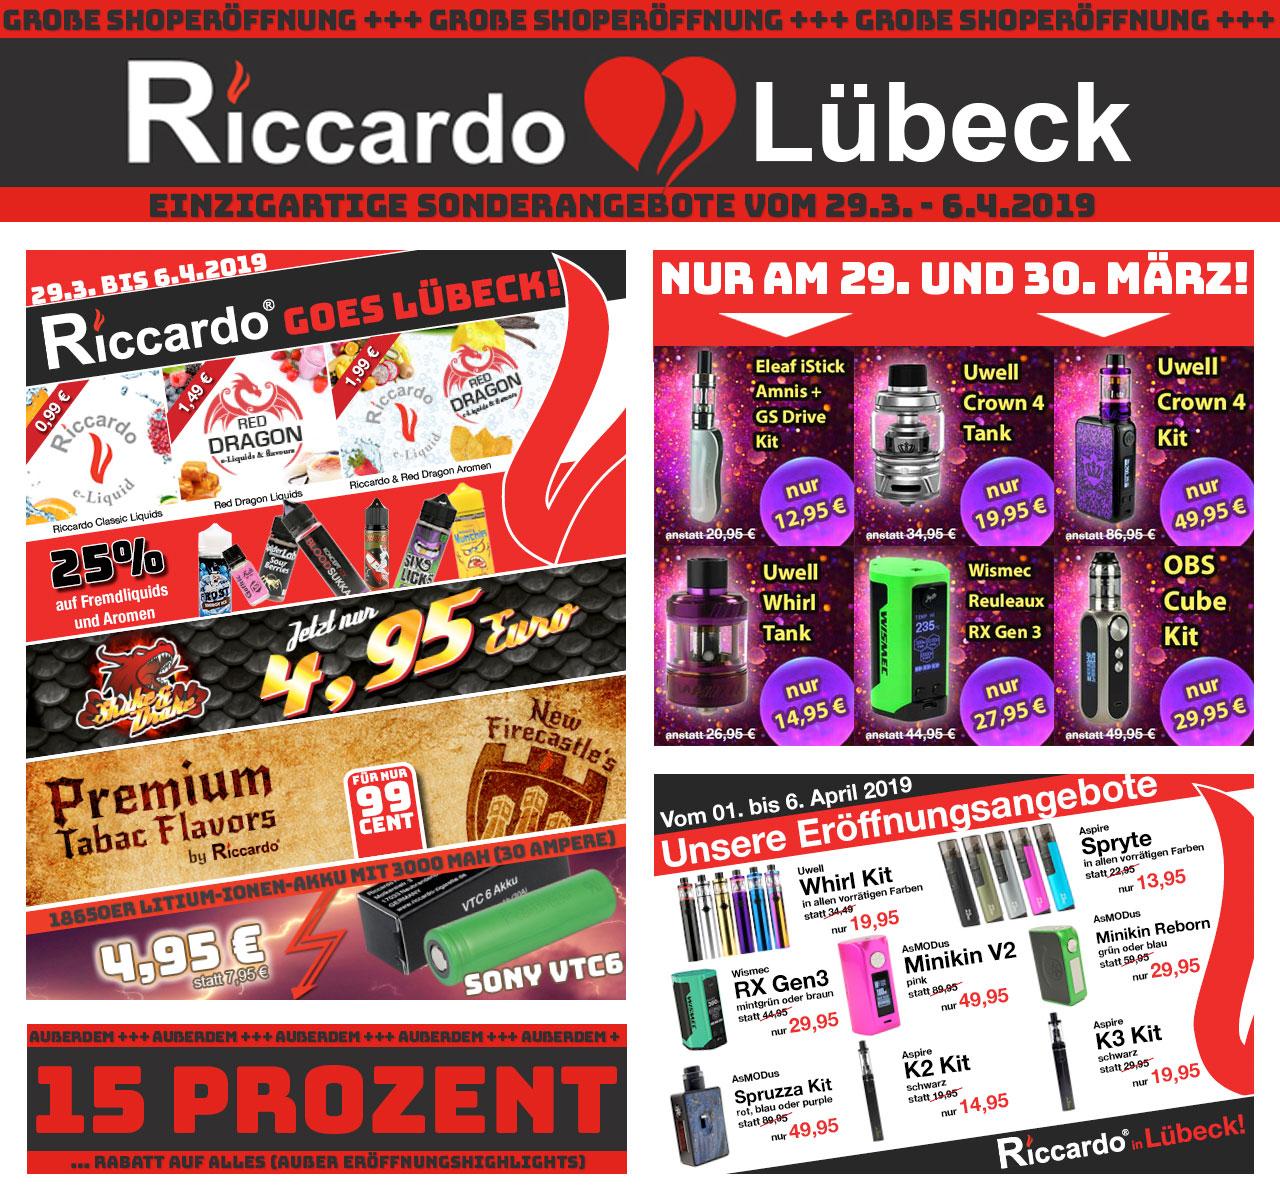 Riccardo Grand Opening in Lübeck am 29.03.2019 (Lokal und online)